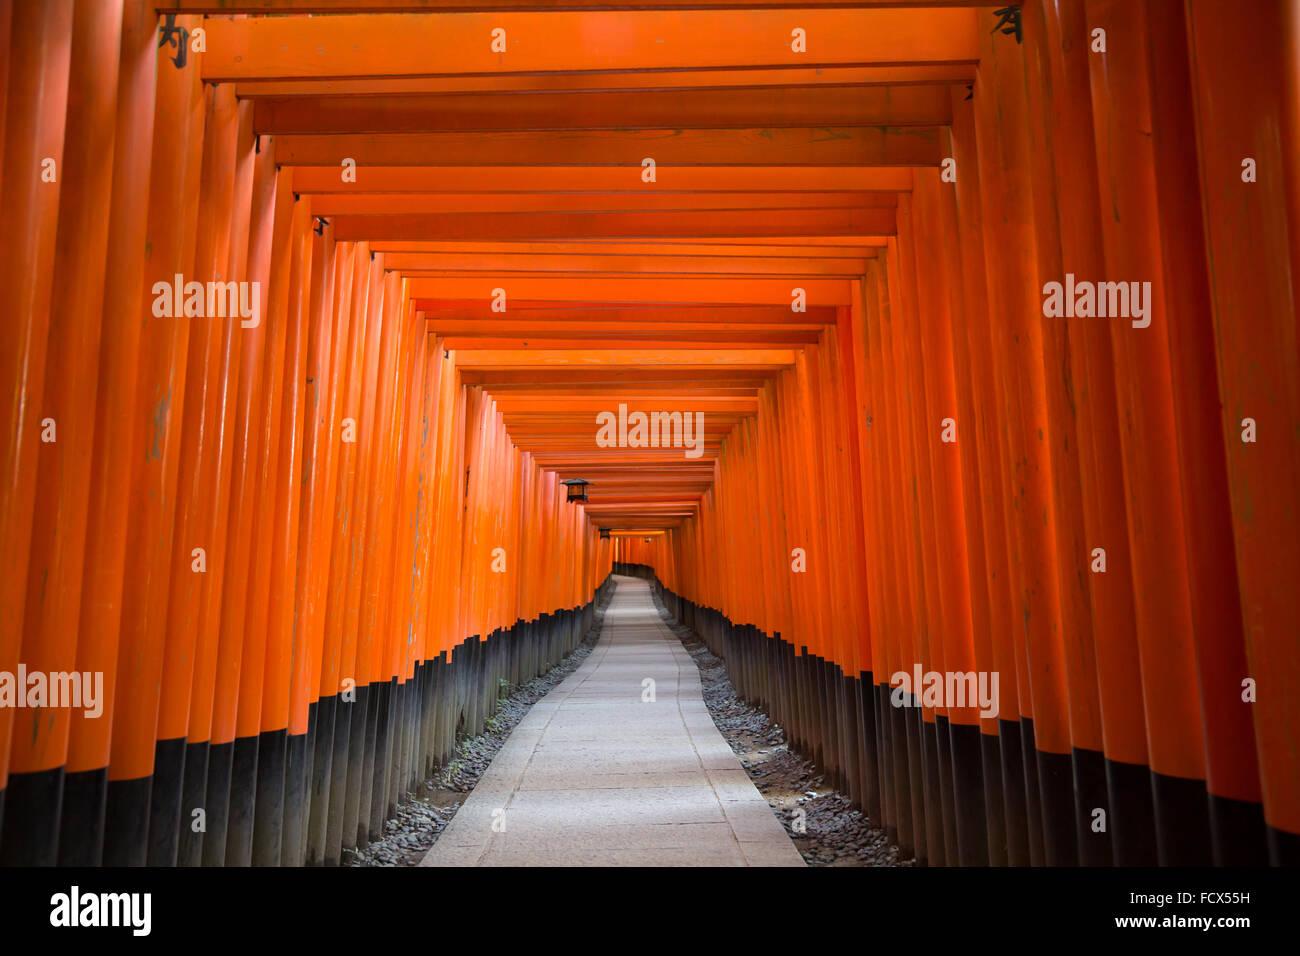 Templo sintoísta japonés en Kyoto - Fushimi Inari (santuario Fushimi Inari Taisha) Imagen De Stock